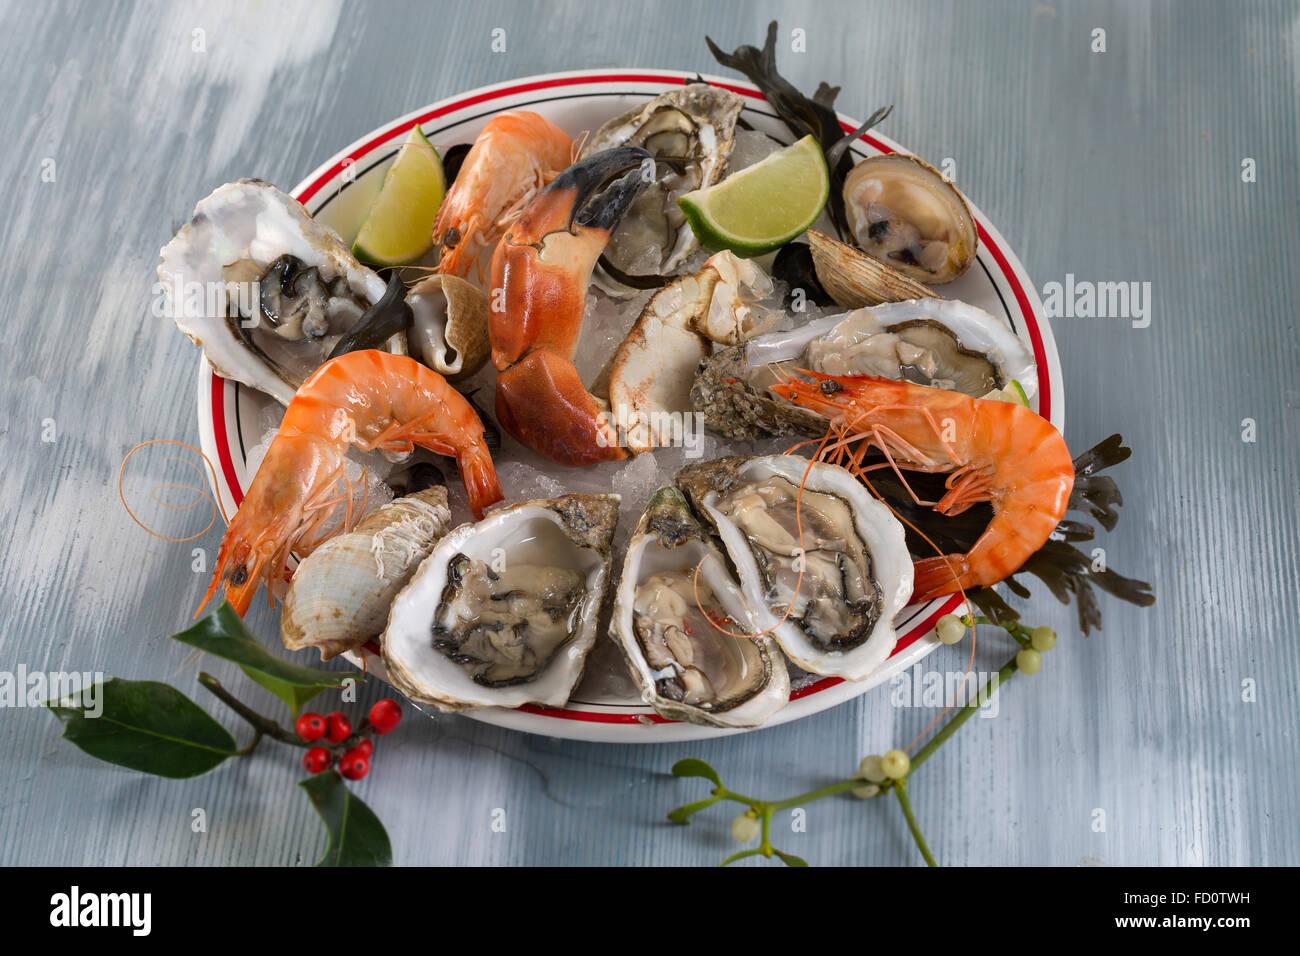 Seafood platter - Stock Image